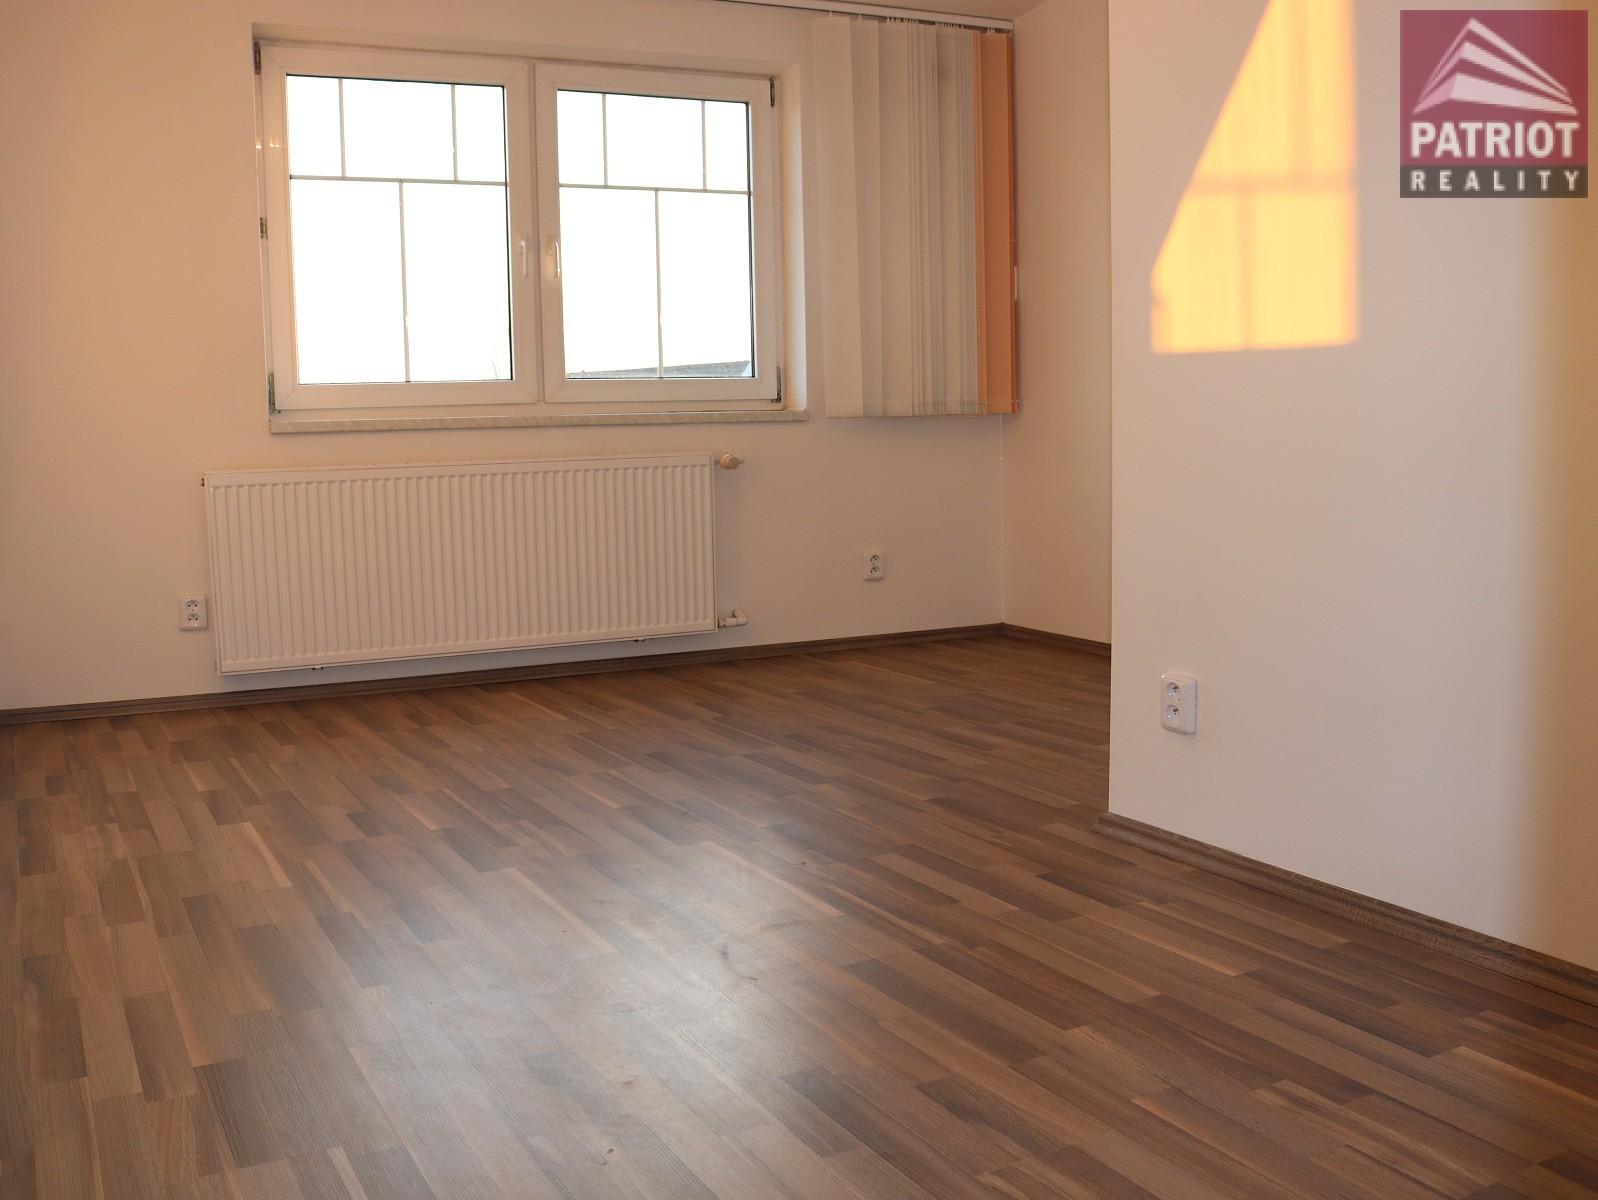 Mezonetový byt 5+1 Rejskova v Olomouci   PRODÁNO - 10